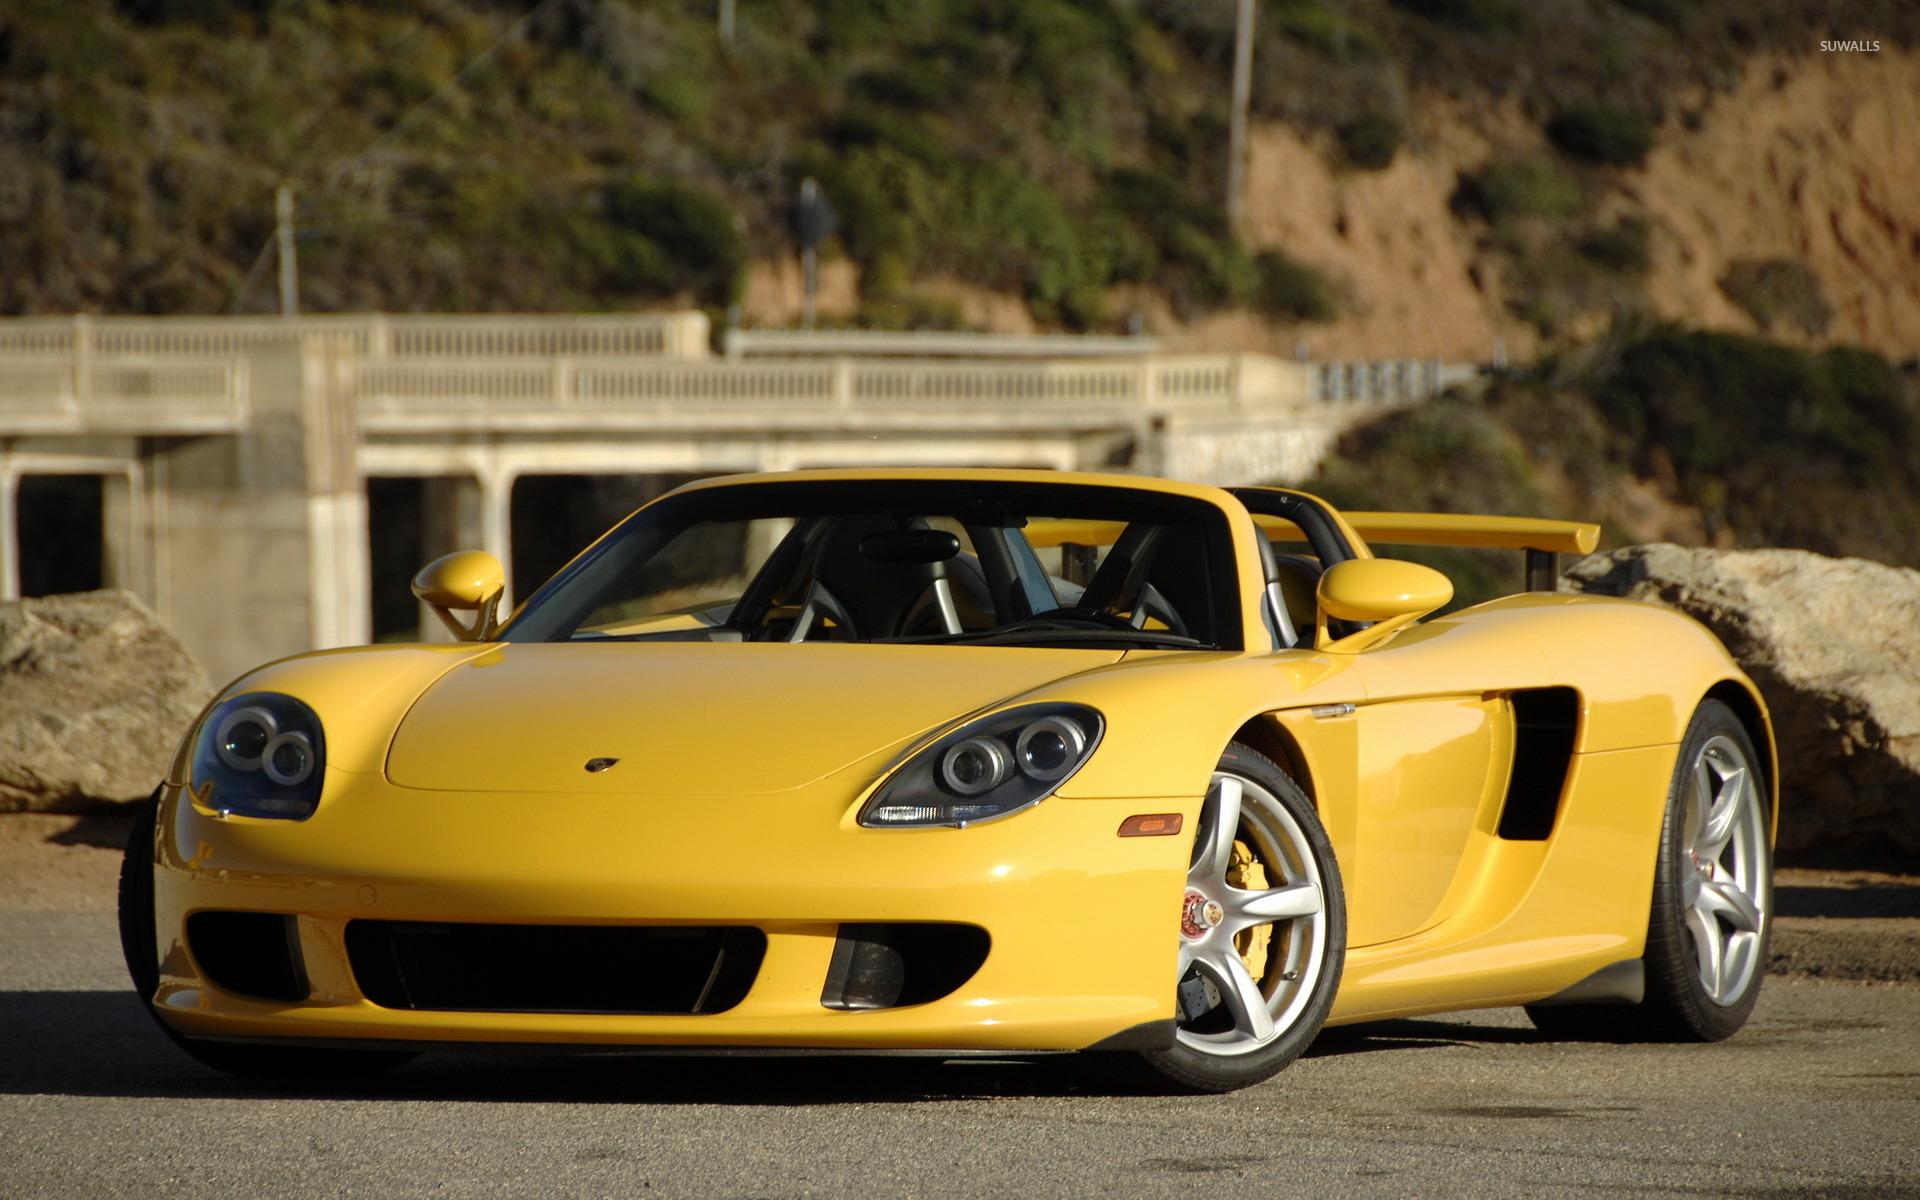 Porsche Carrera Gt Images Porsche Carrera Gt Hd Wallpaper And